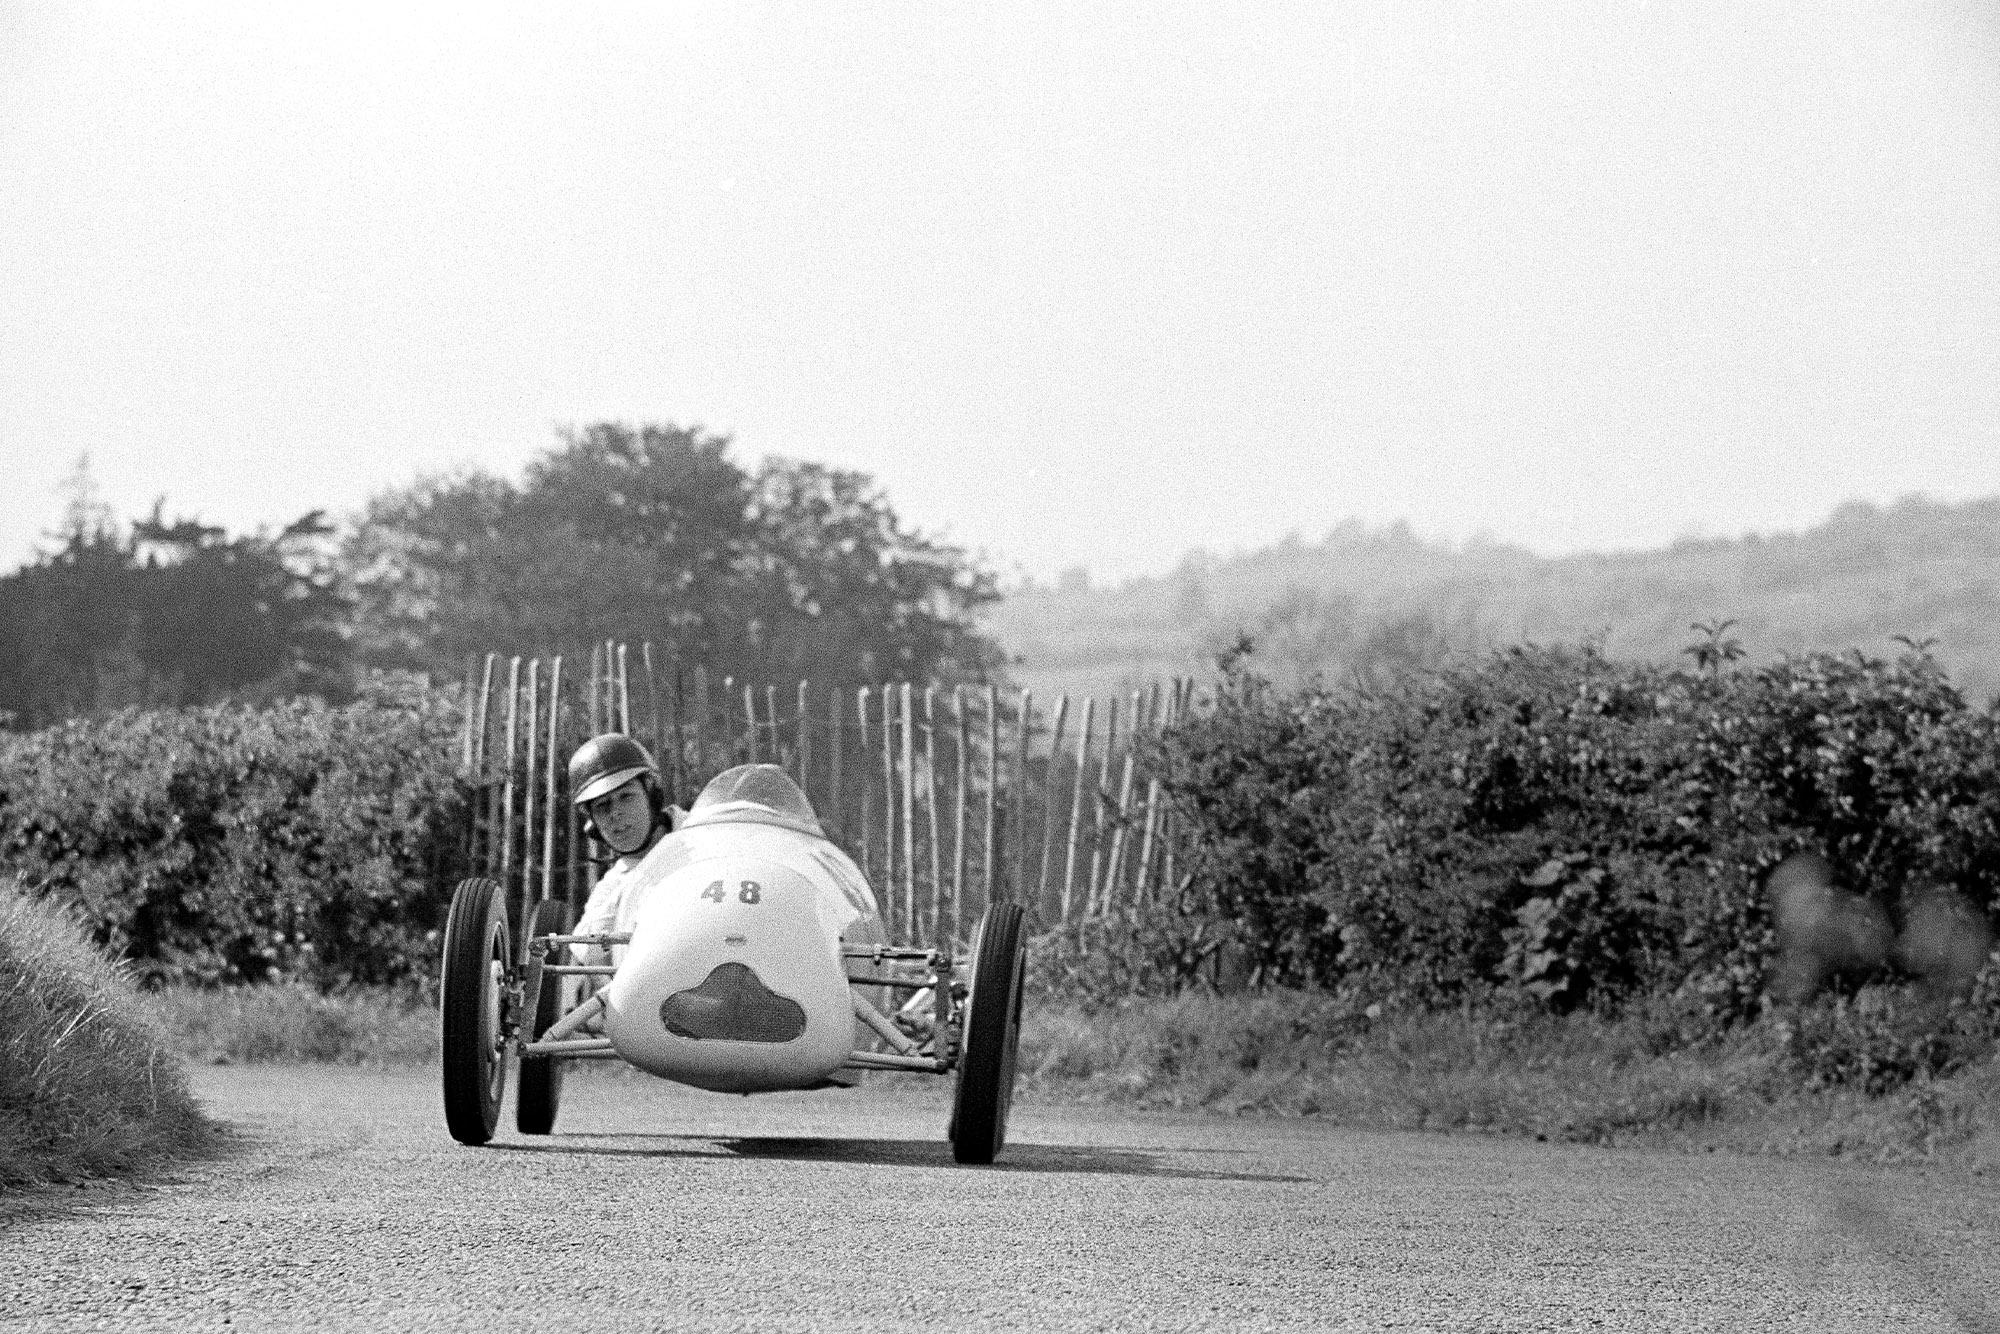 Stirling Moss at the Prescott Hillclimb in 1948